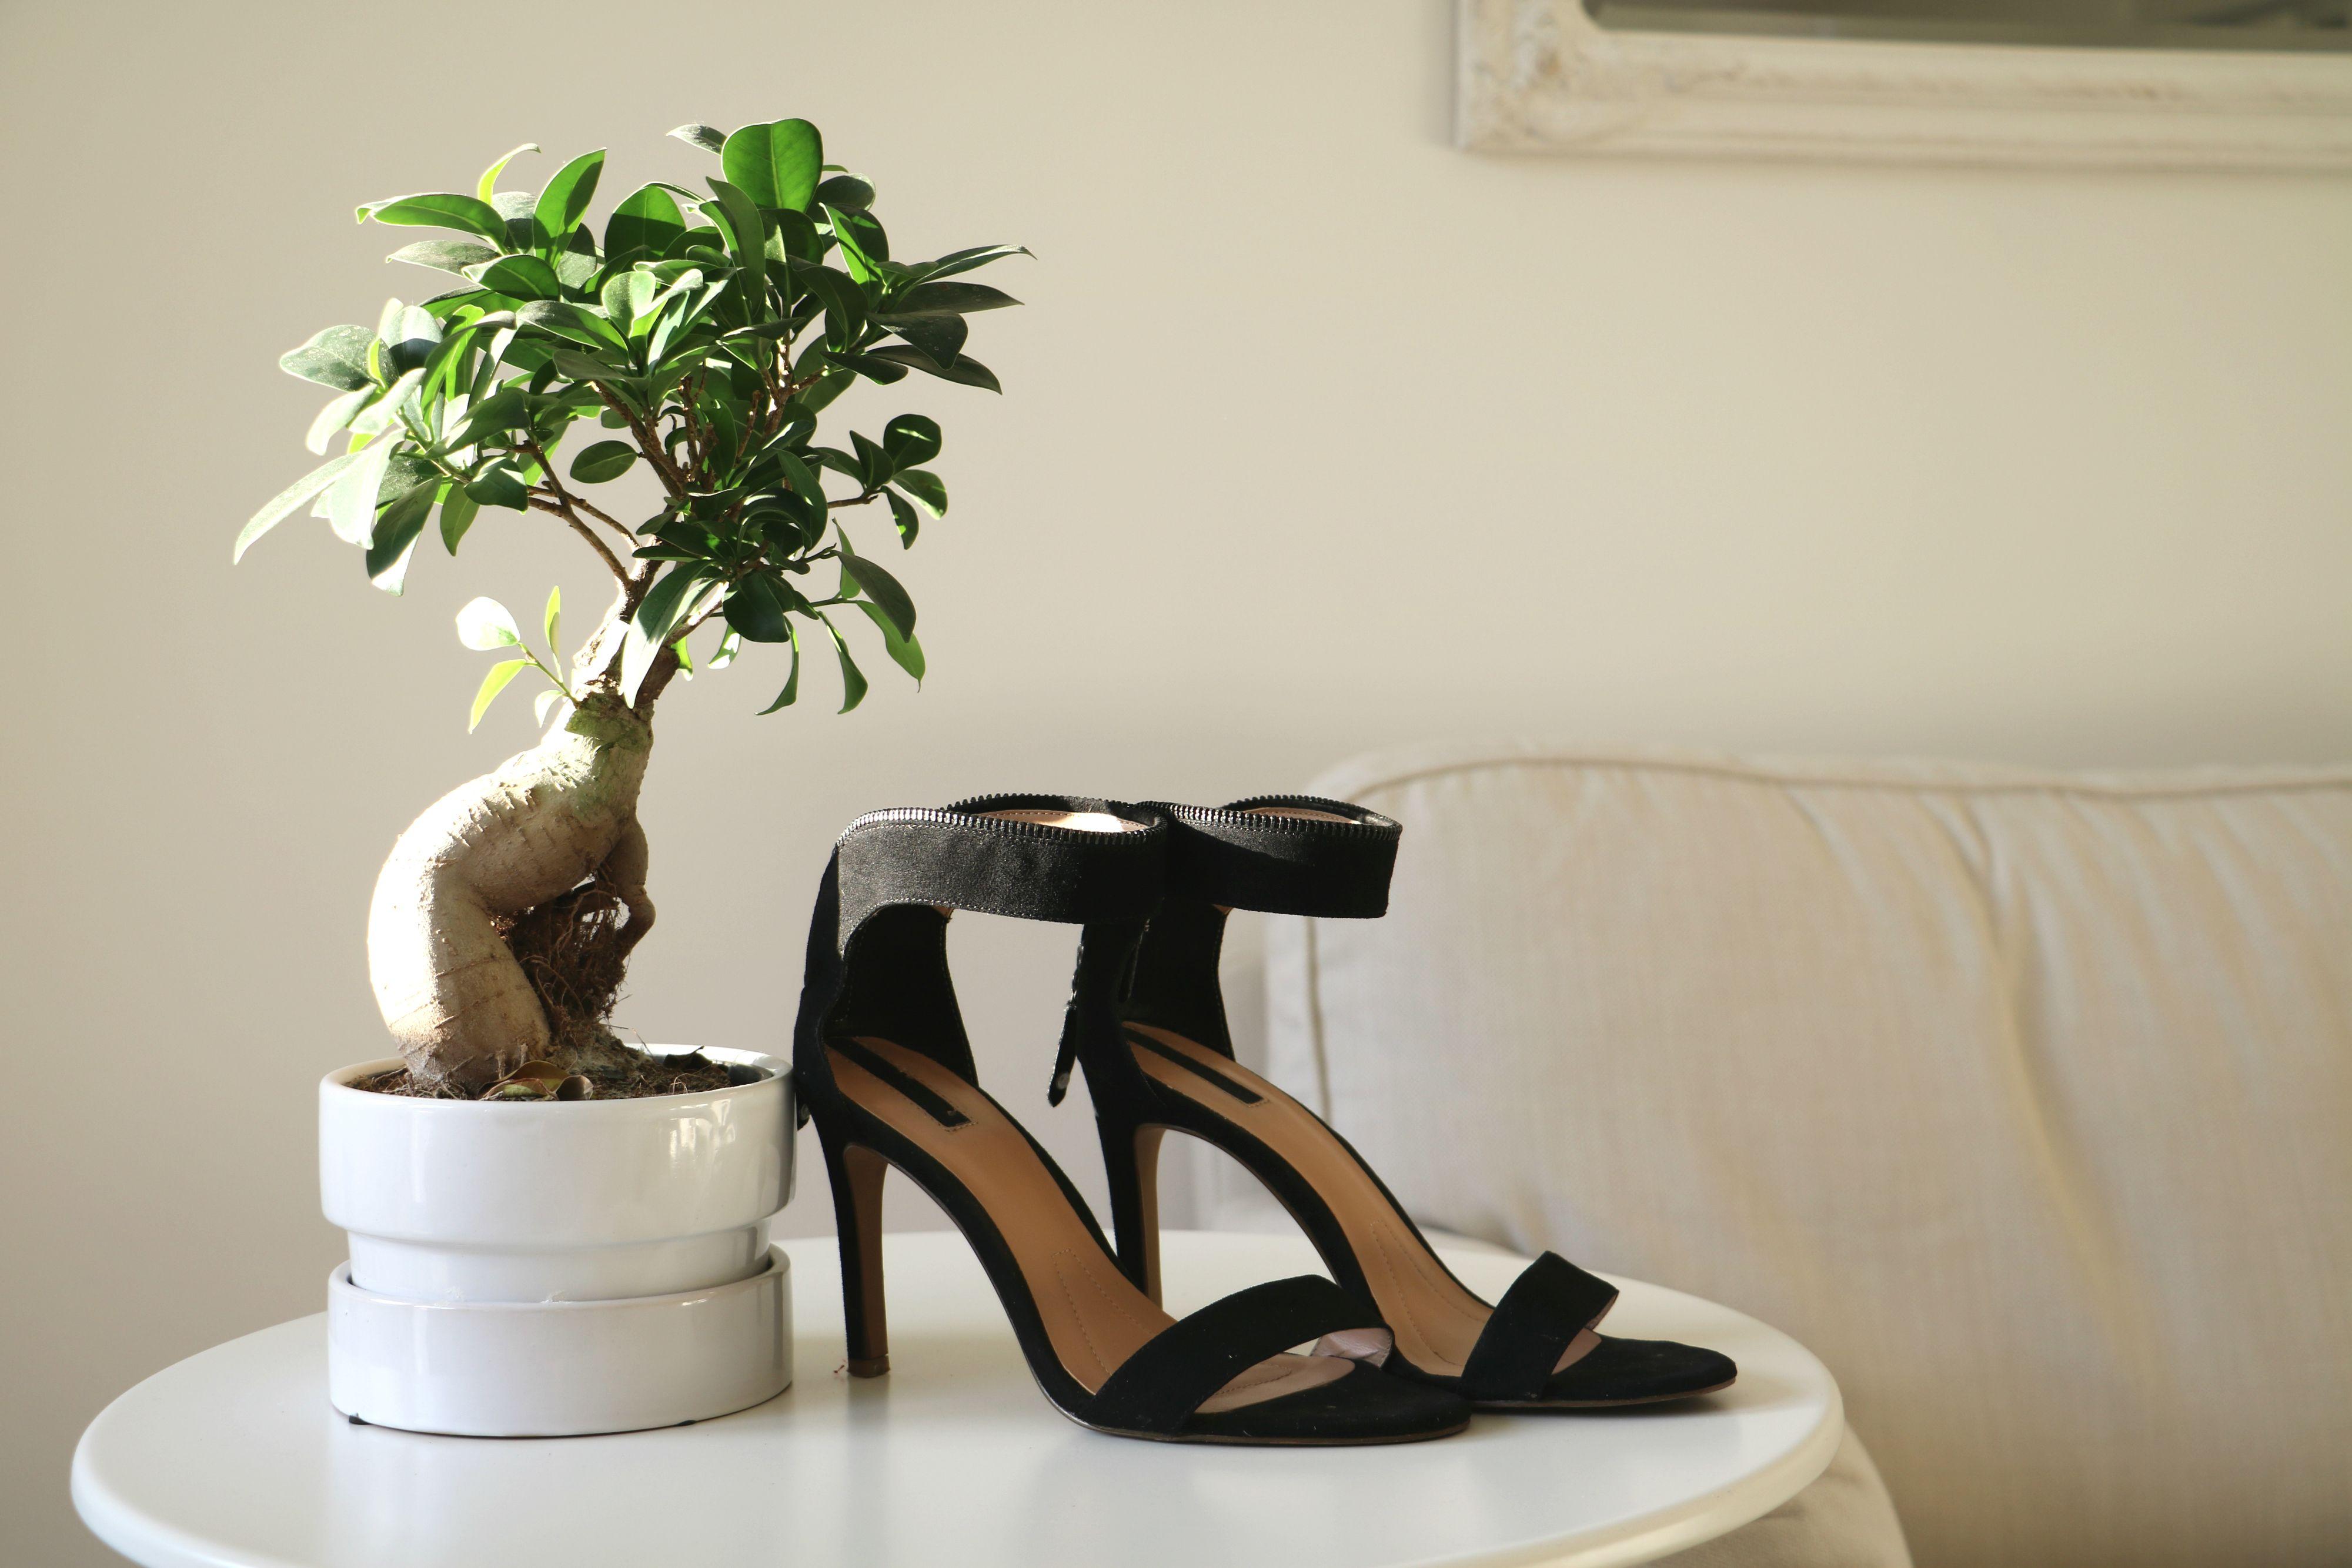 favorites, shoes, minimal style